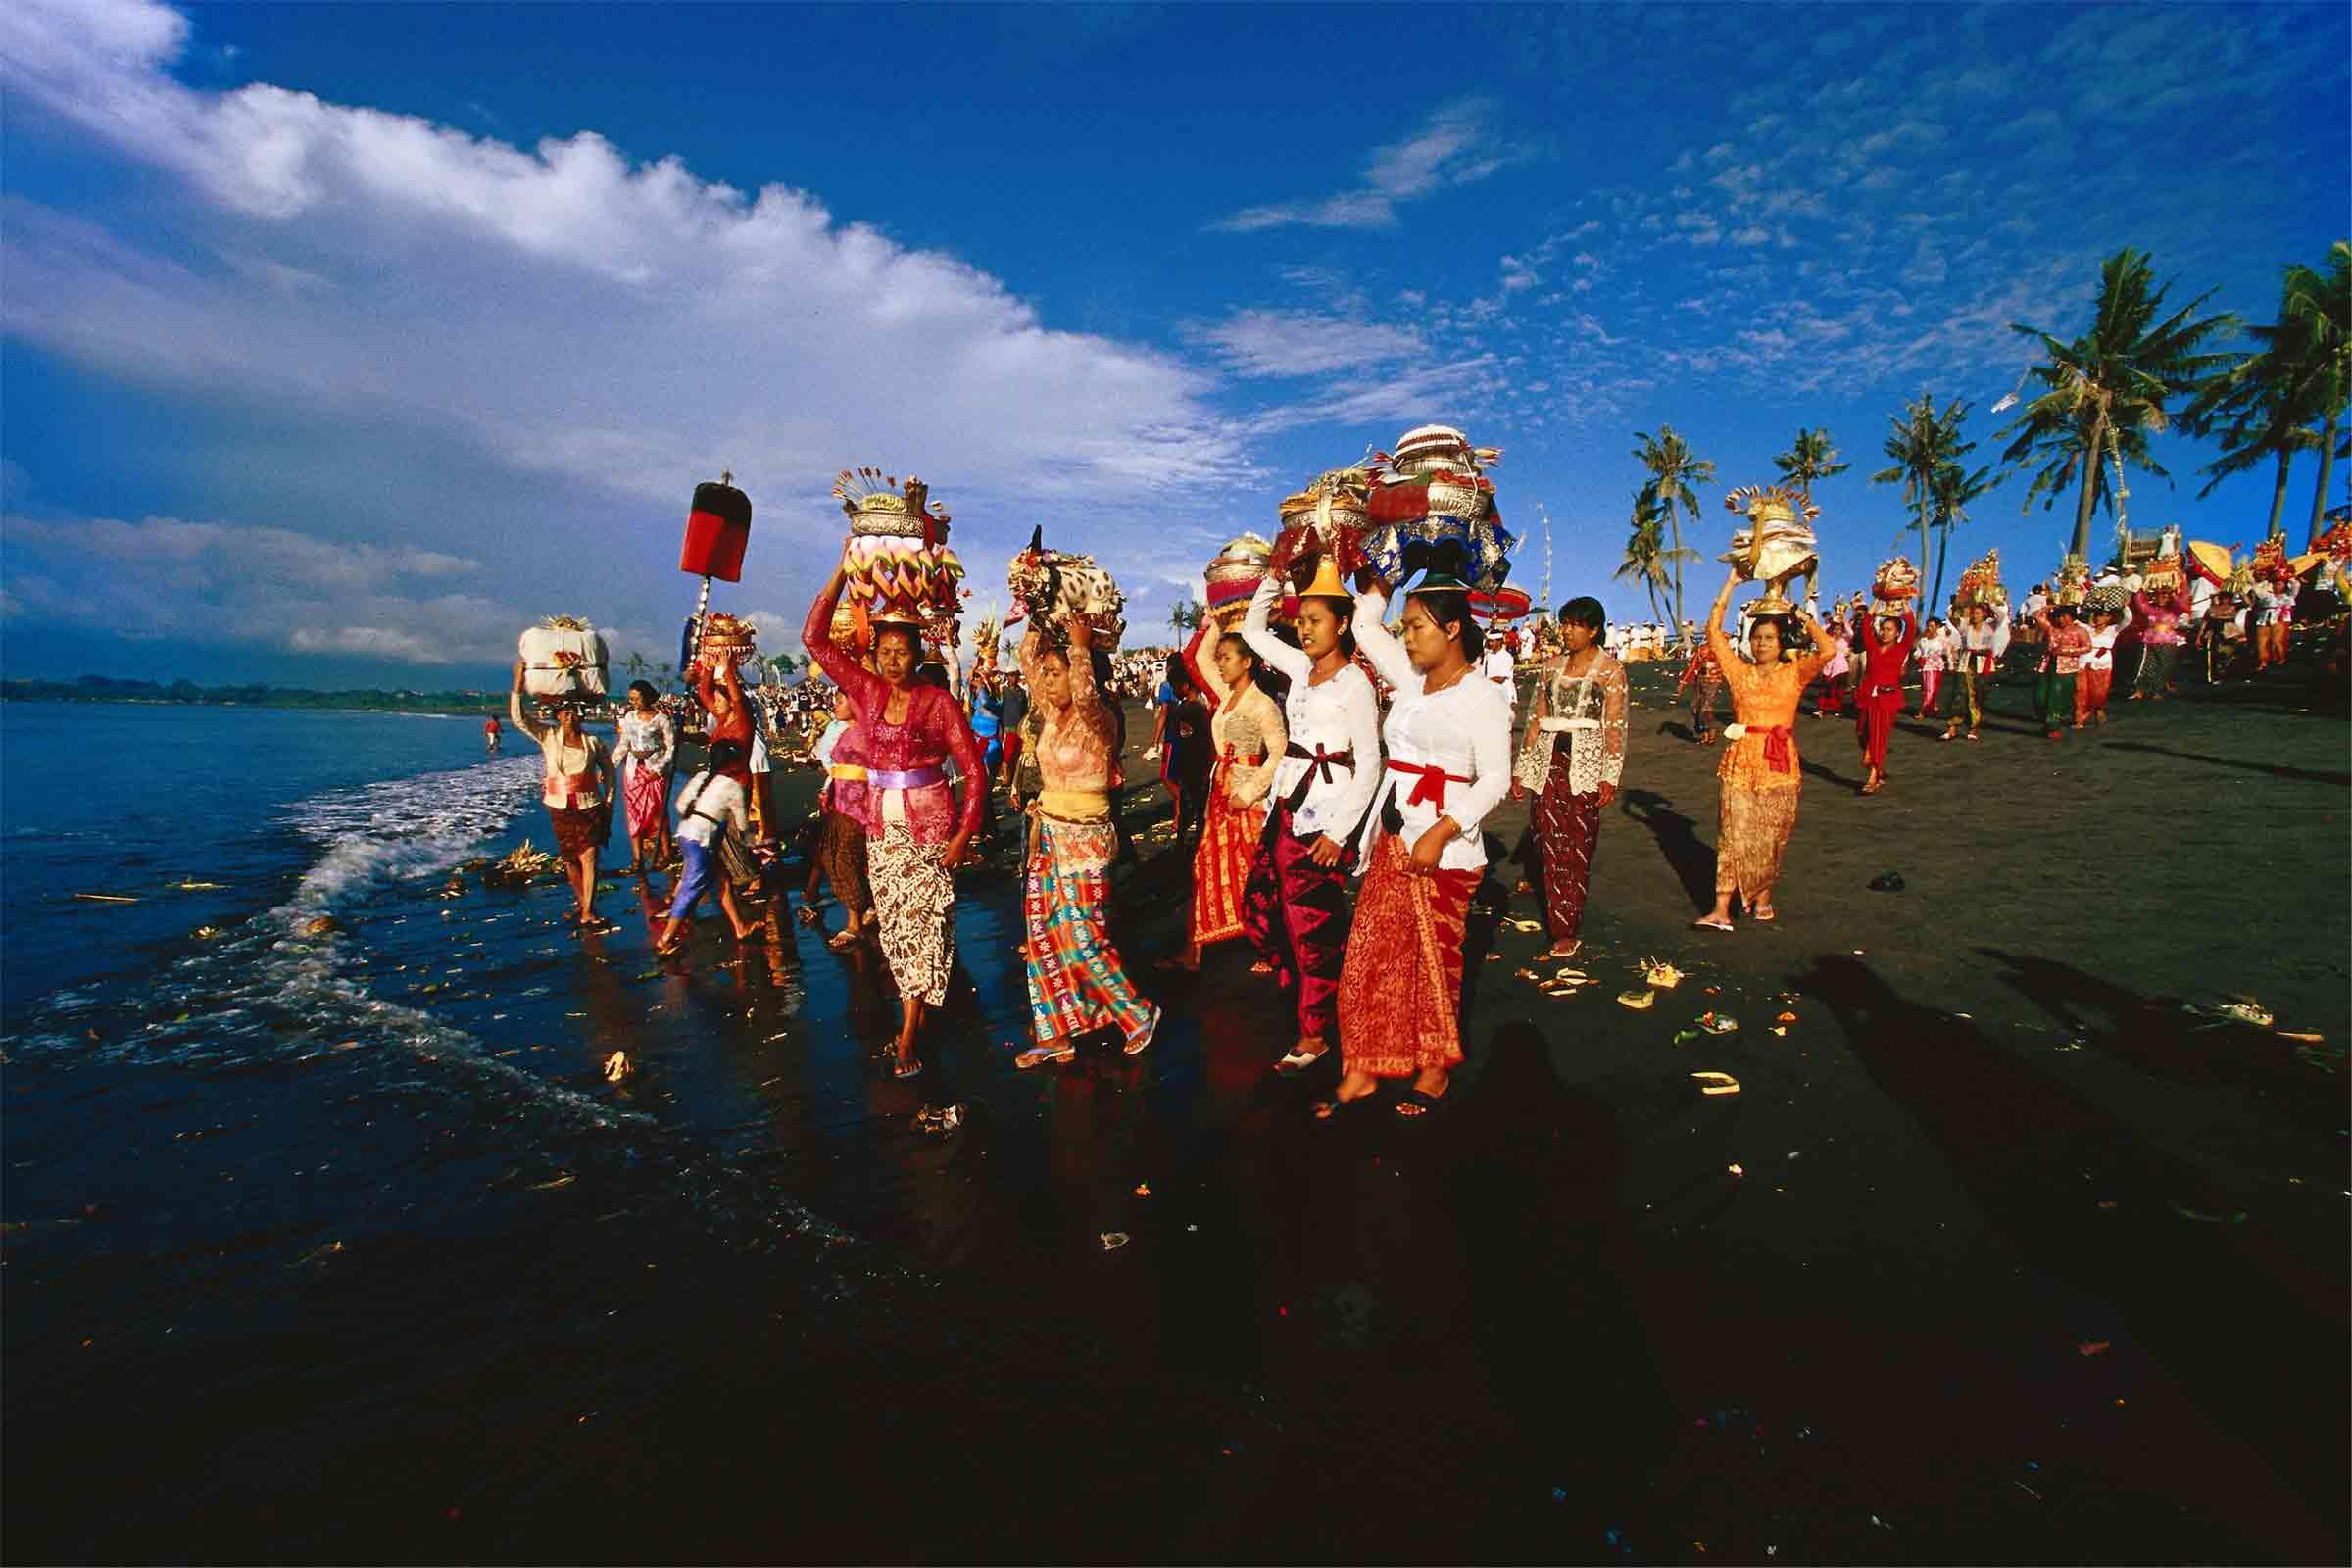 Fete de la musique 2019 indonesische Hochzeitsprozession